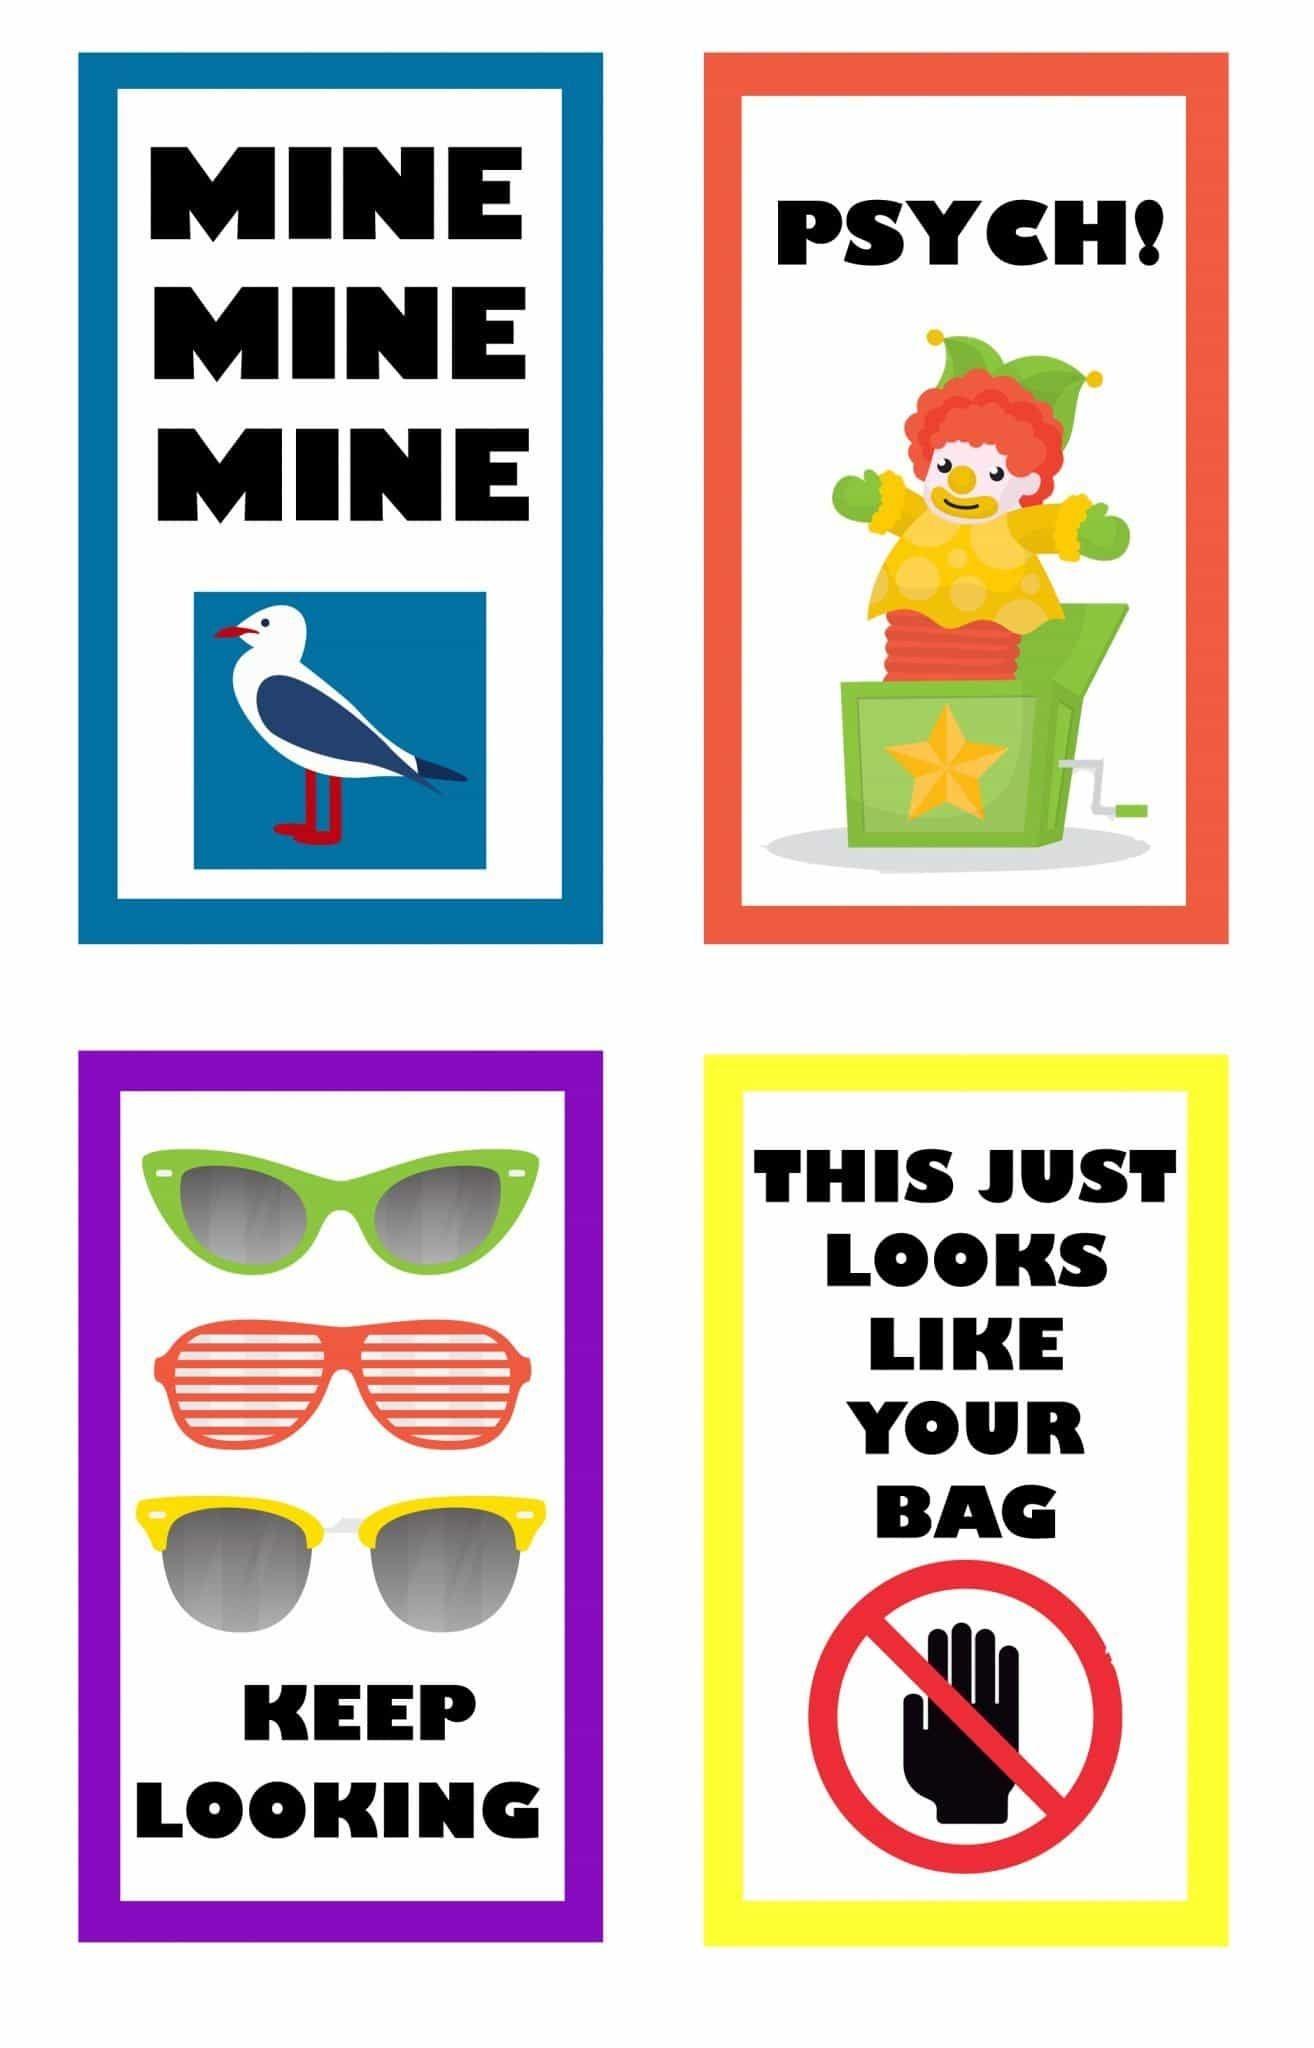 Funny Free Printable Luggage Tags | Luggage Tags | Travel Tags, Tags - Free Printable Luggage Tags